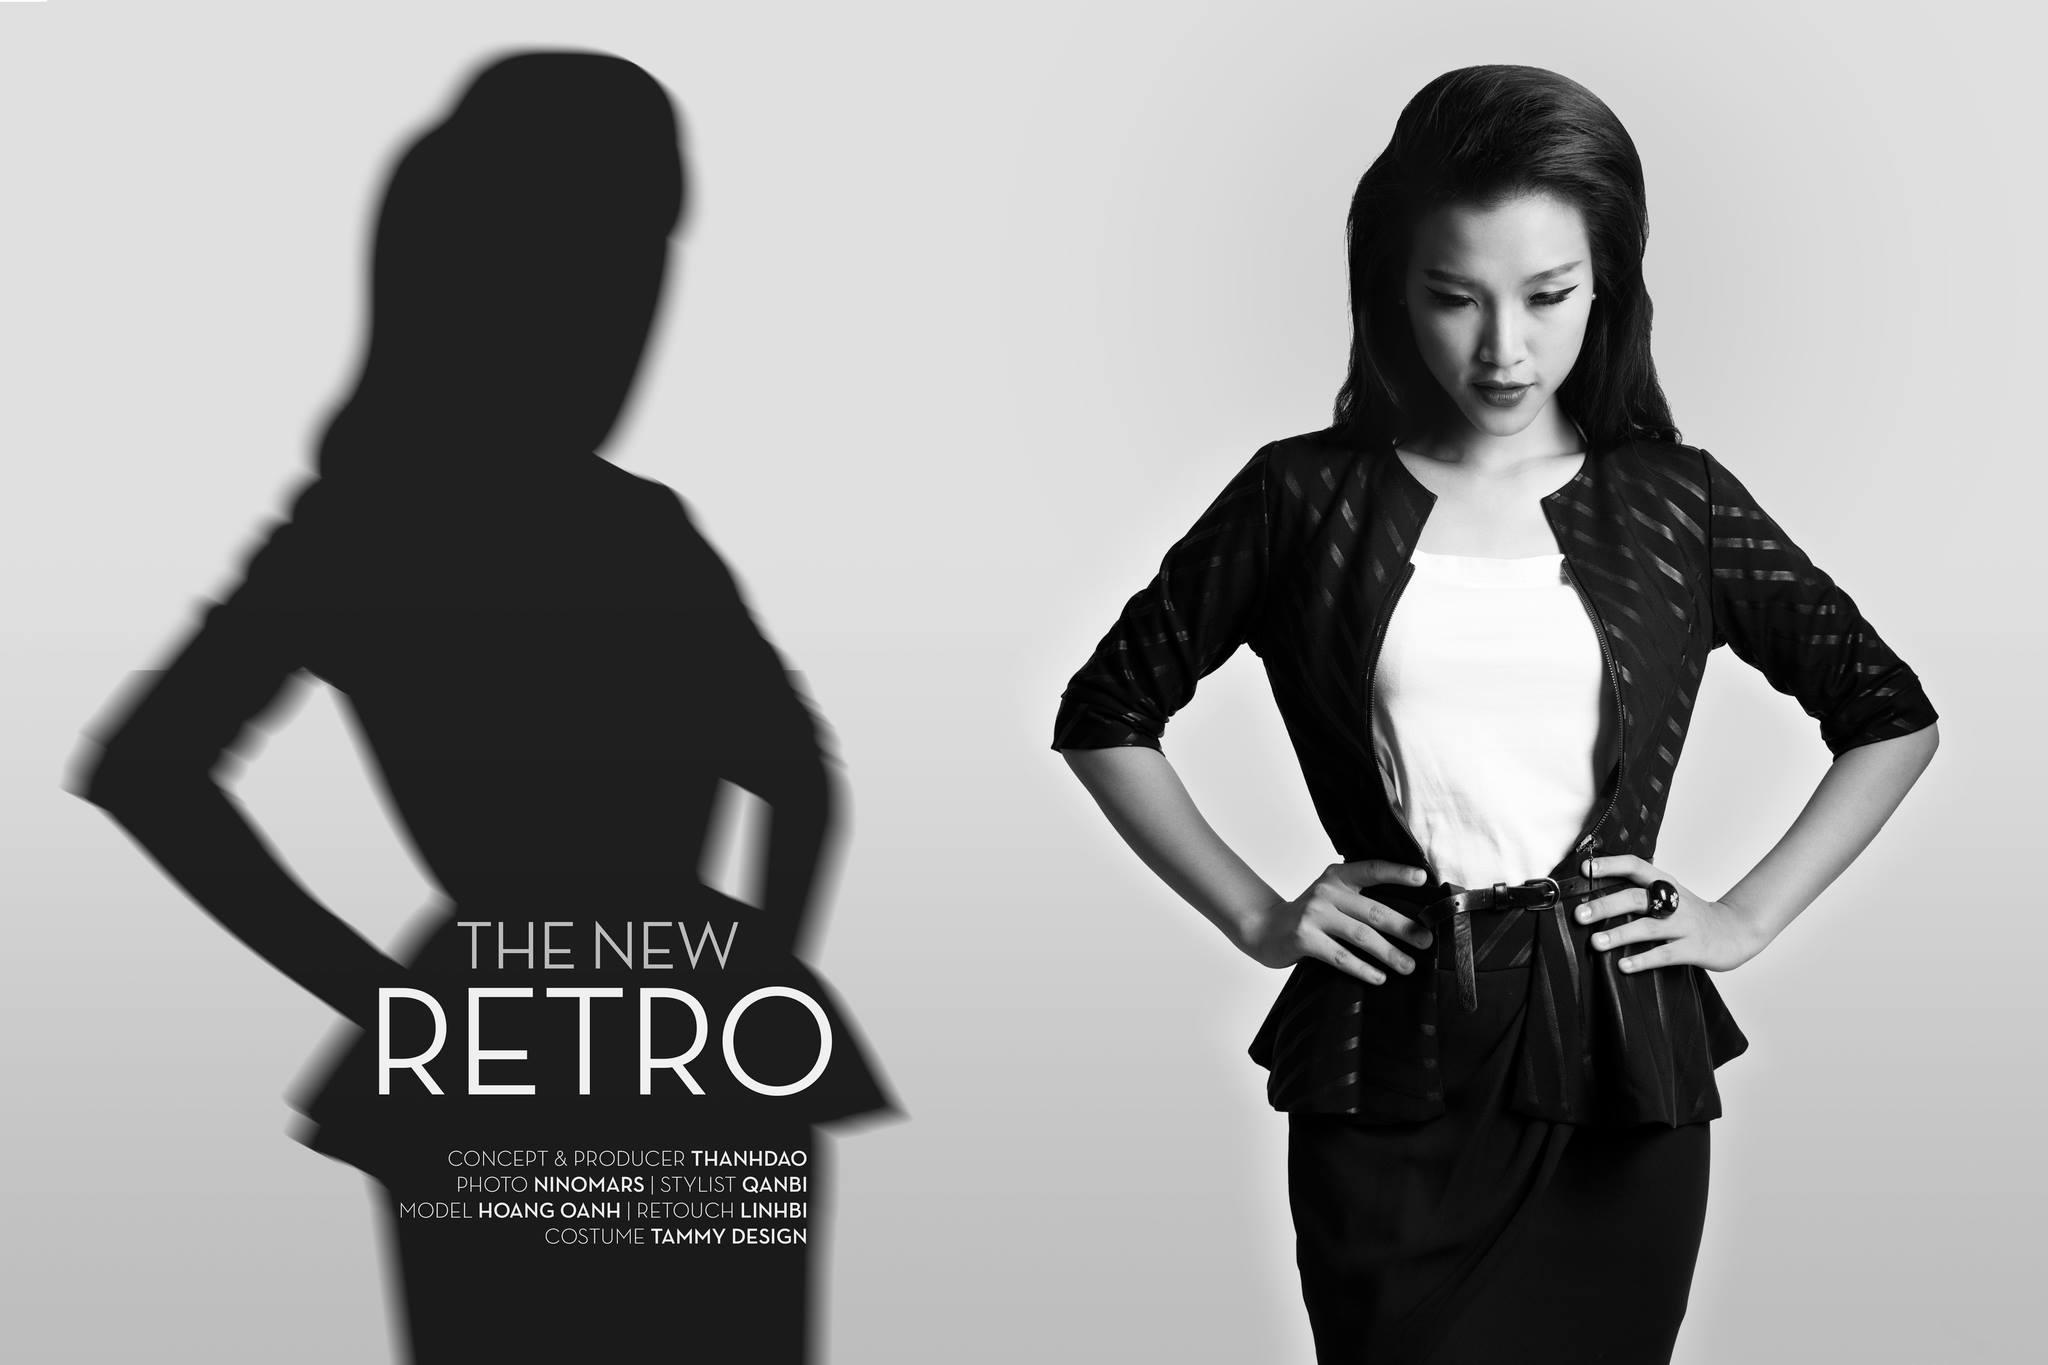 THE NEW RETRO - JULY 2013